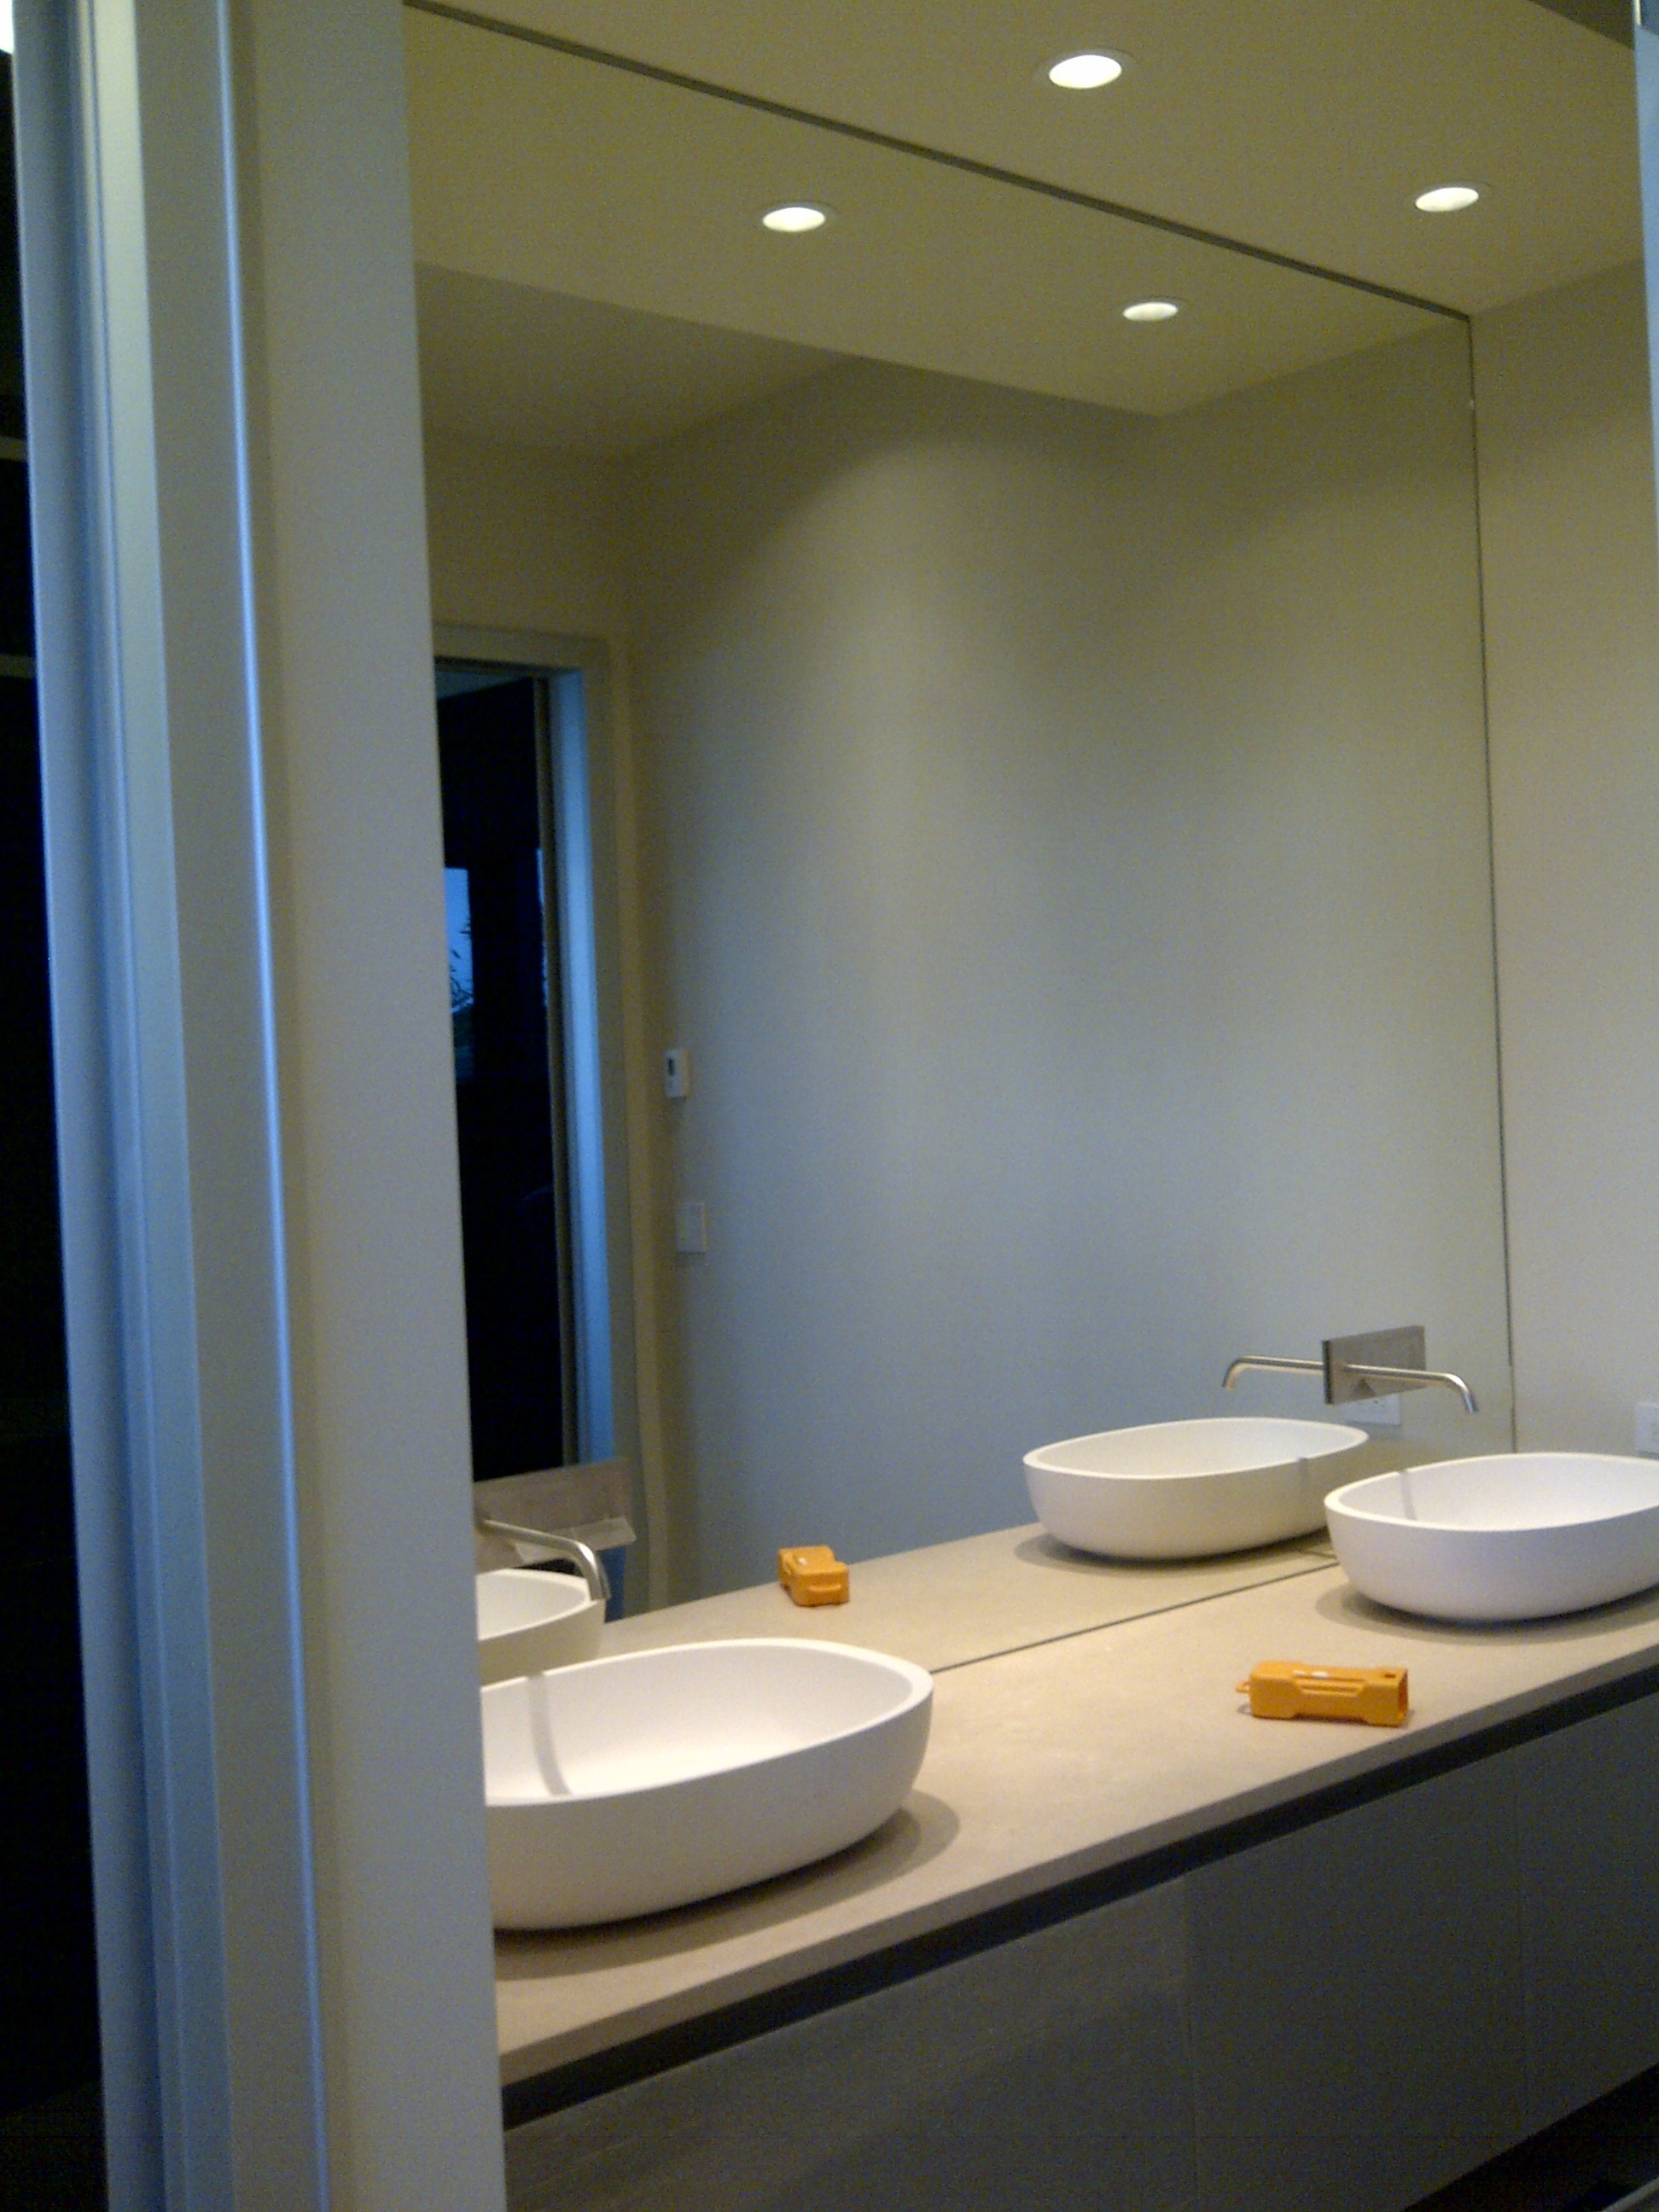 Bathroom Wall Mirrors Unique Vanity Vanity Mirrors for Bathroom Bathroom Wall Mirrors Double Pattern